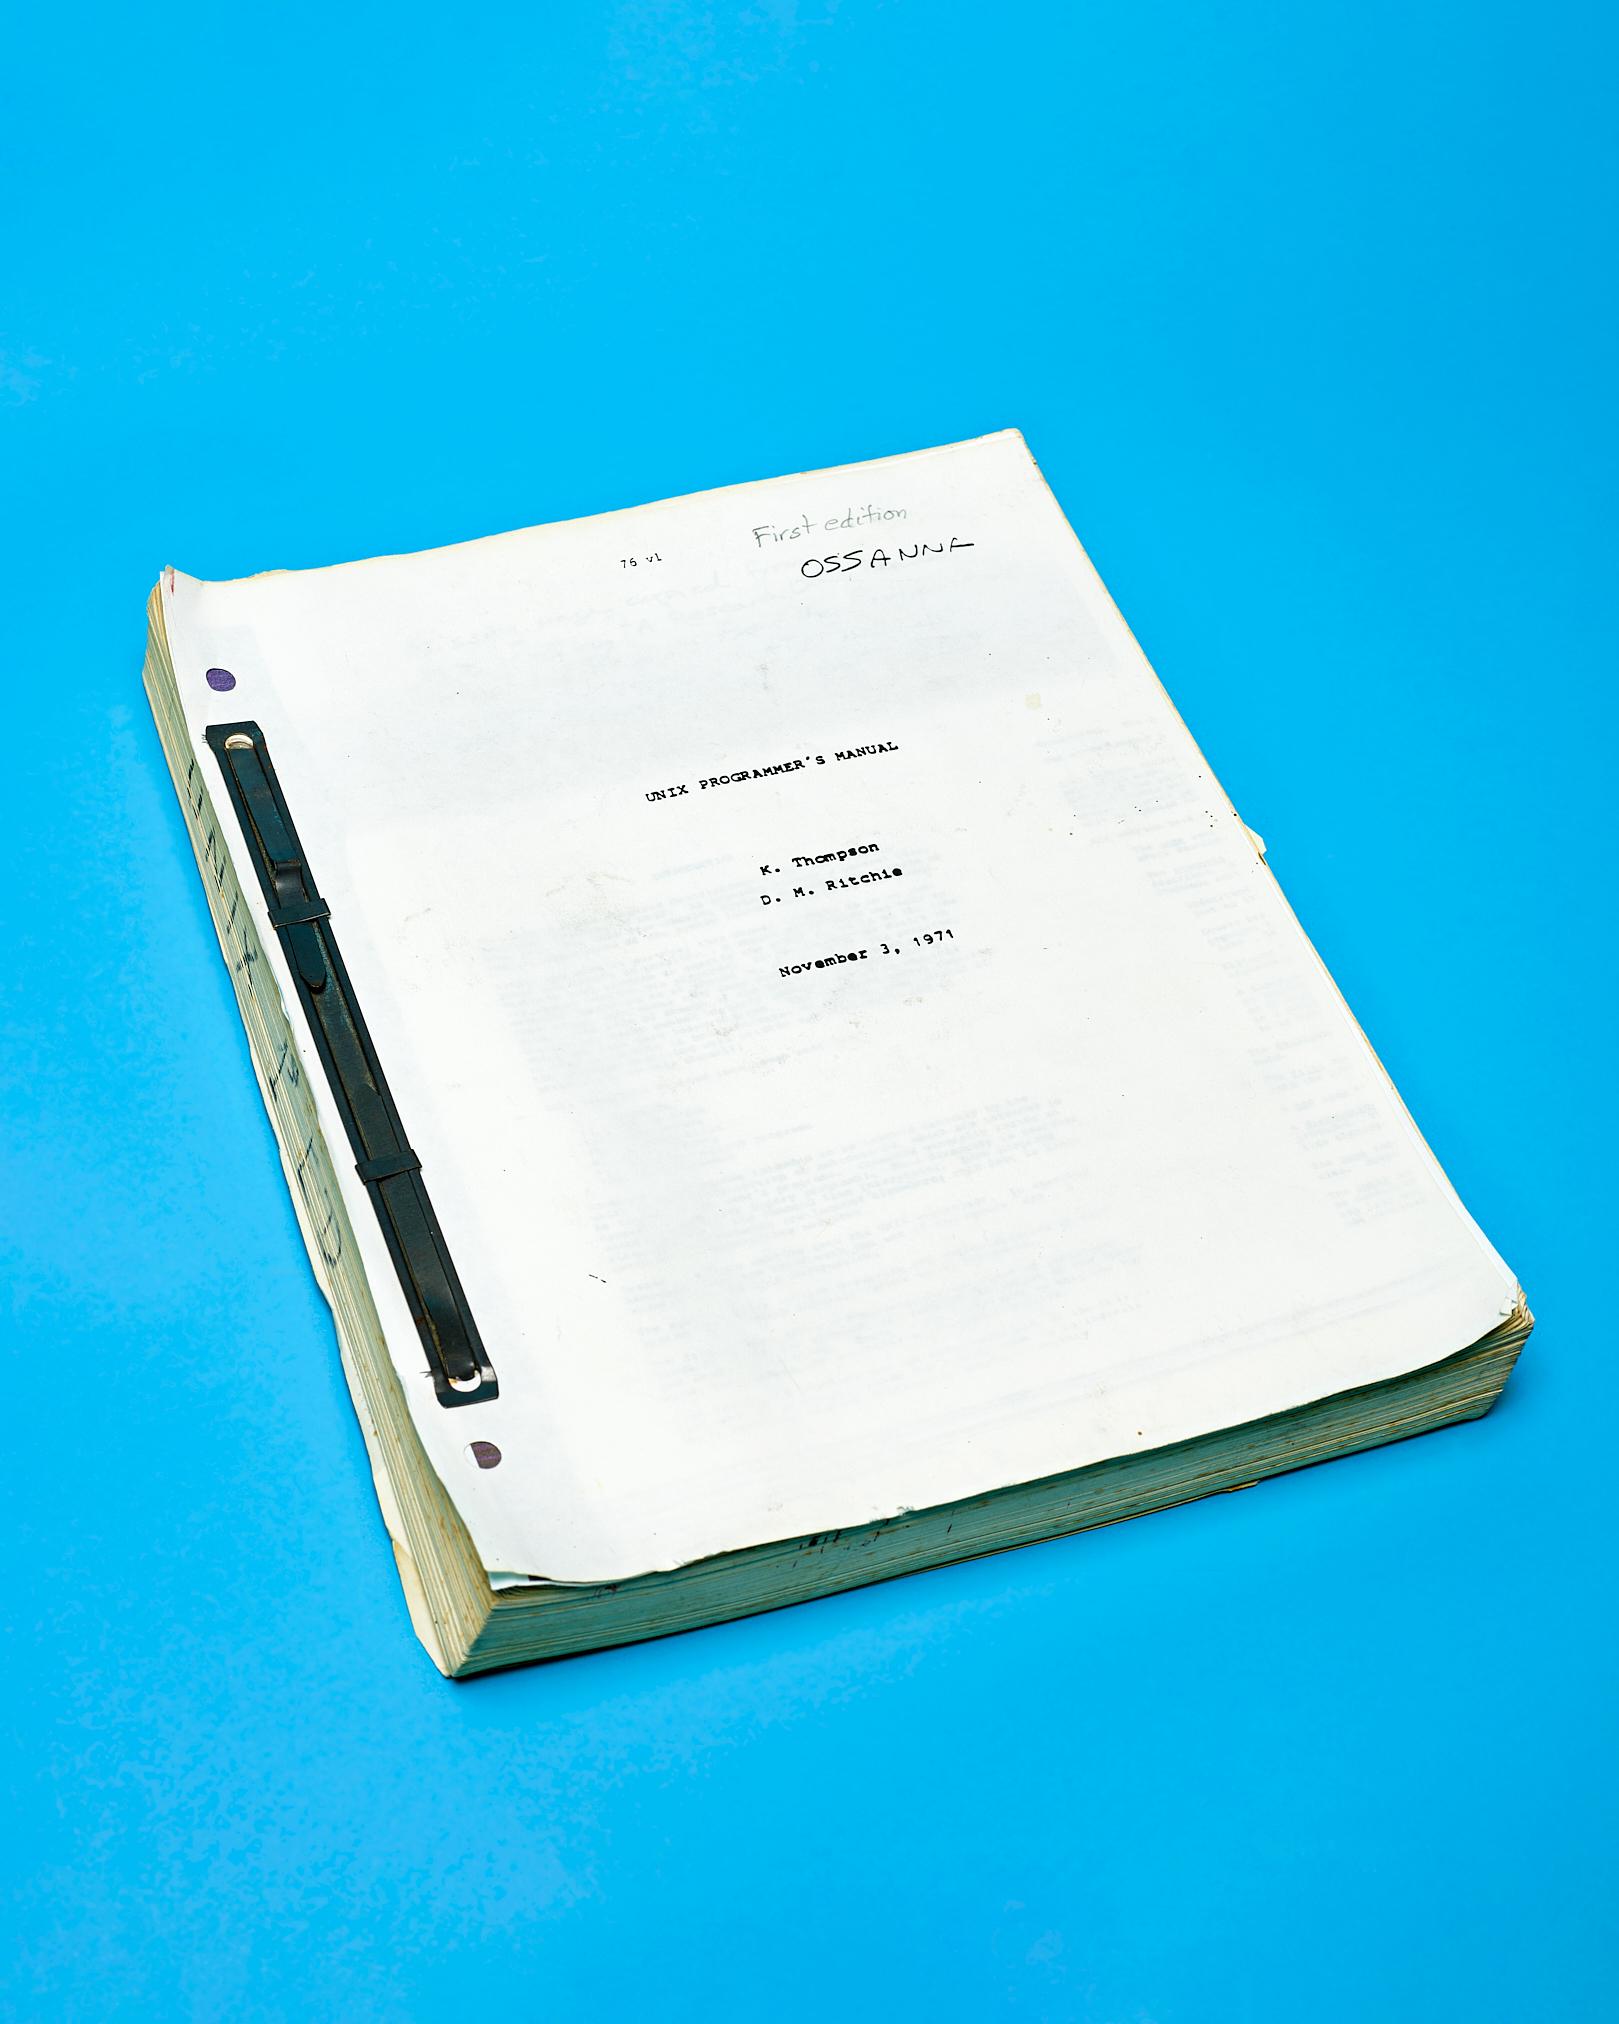 Unix Programer's Manual (1st  Edition) by Peter Adams.